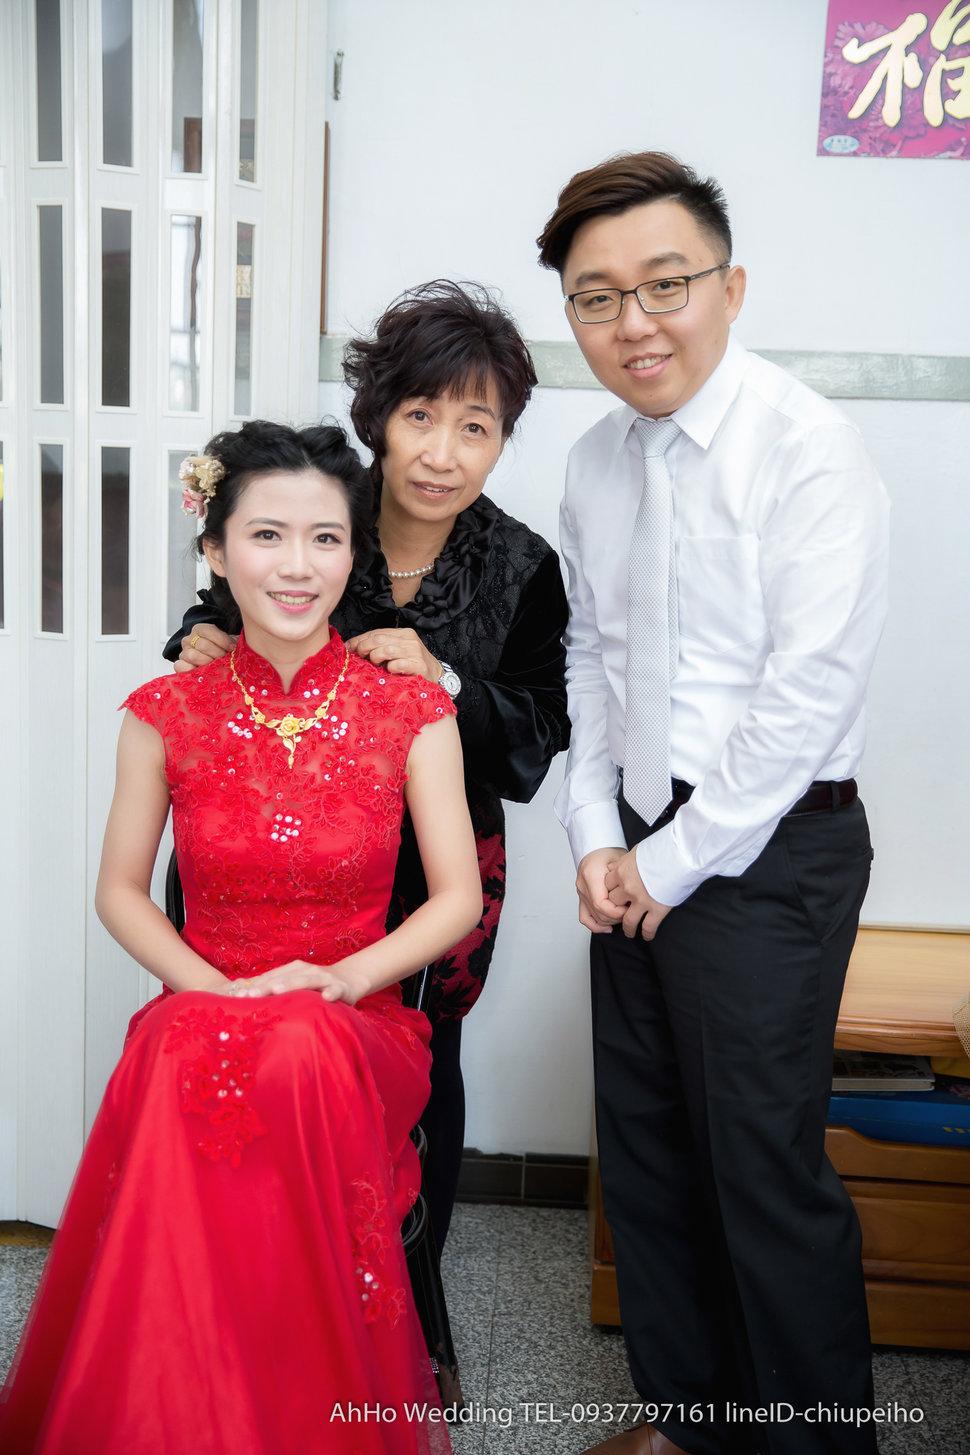 AhHo Wedding TEL-0937797161 lineID-chiupeiho (43 - 163) - AhHoWedding/阿河婚攝《結婚吧》